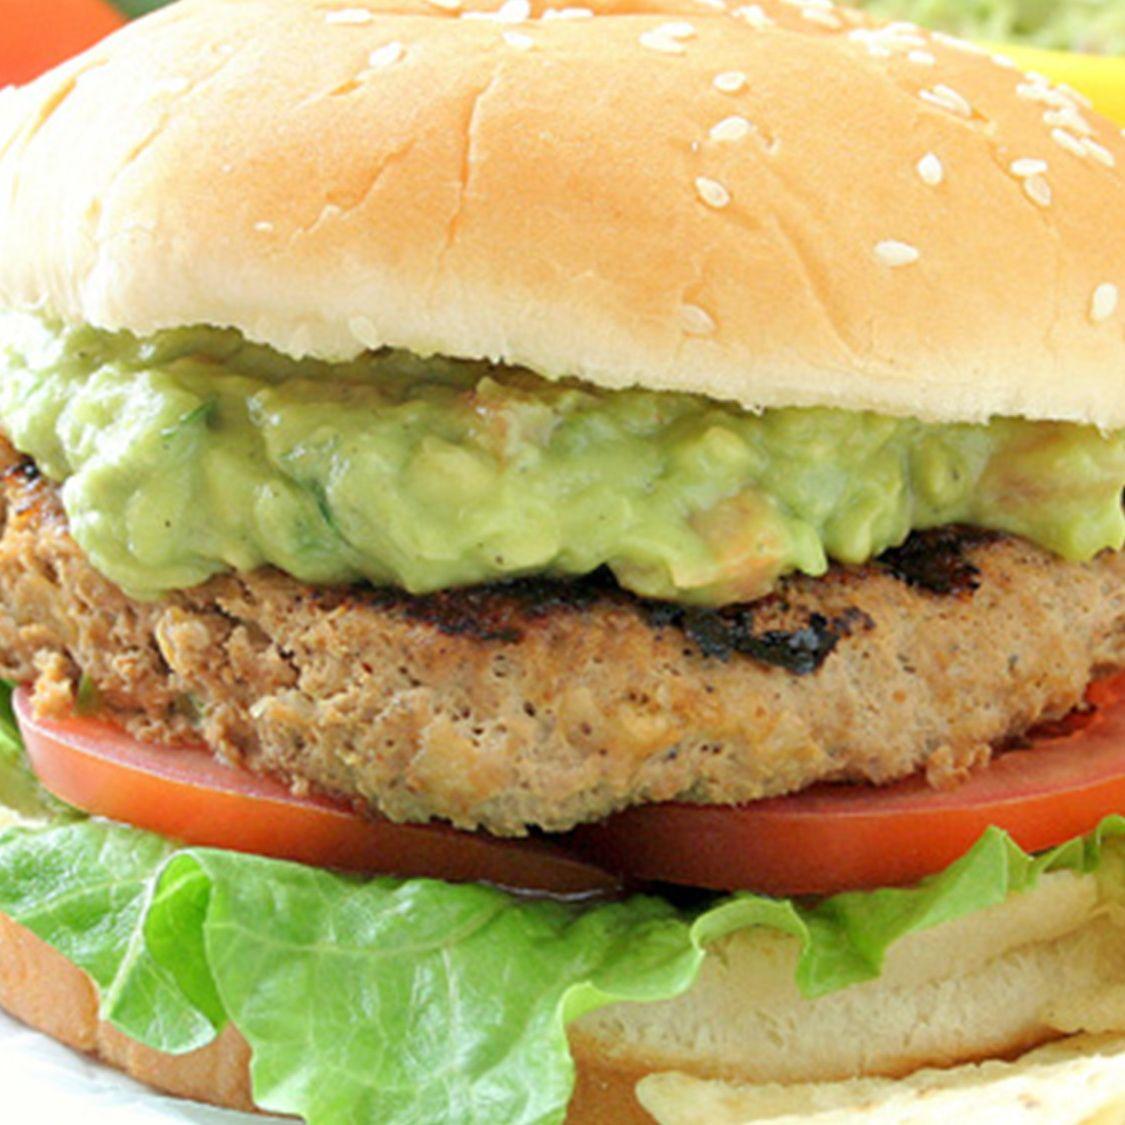 tex_mex_burgers_with_guacamole.jpg